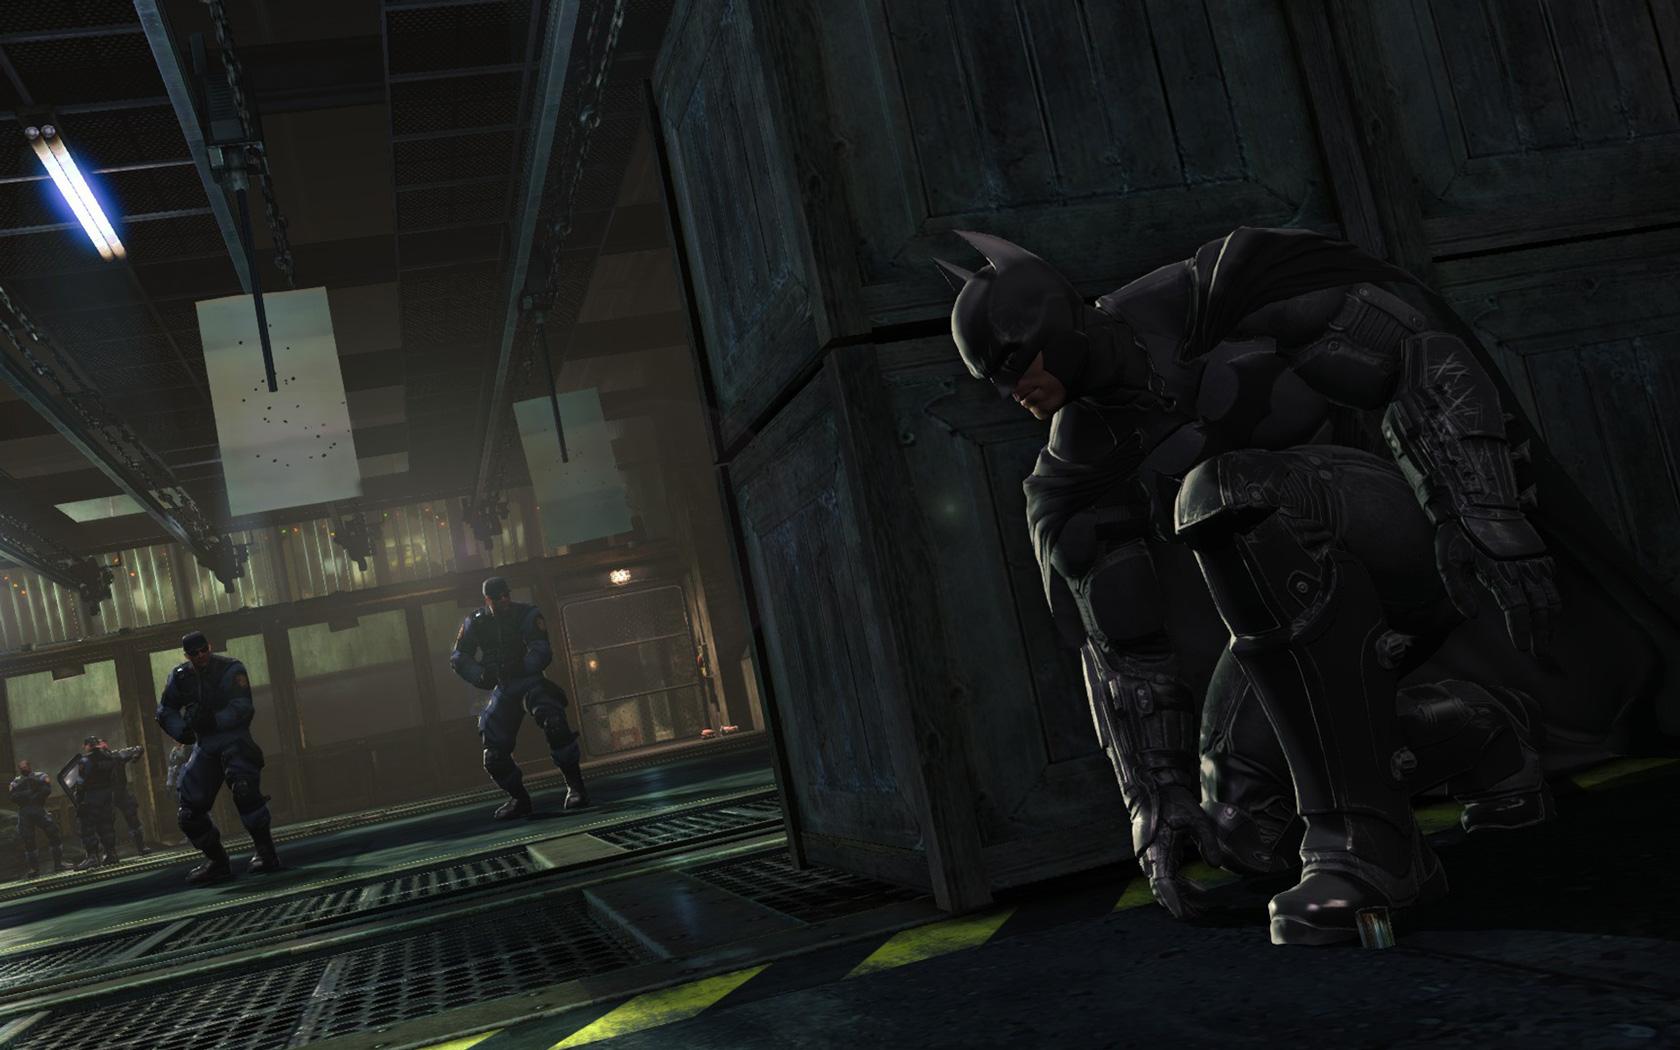 Free Batman: Arkham Origins Wallpaper in 1680x1050